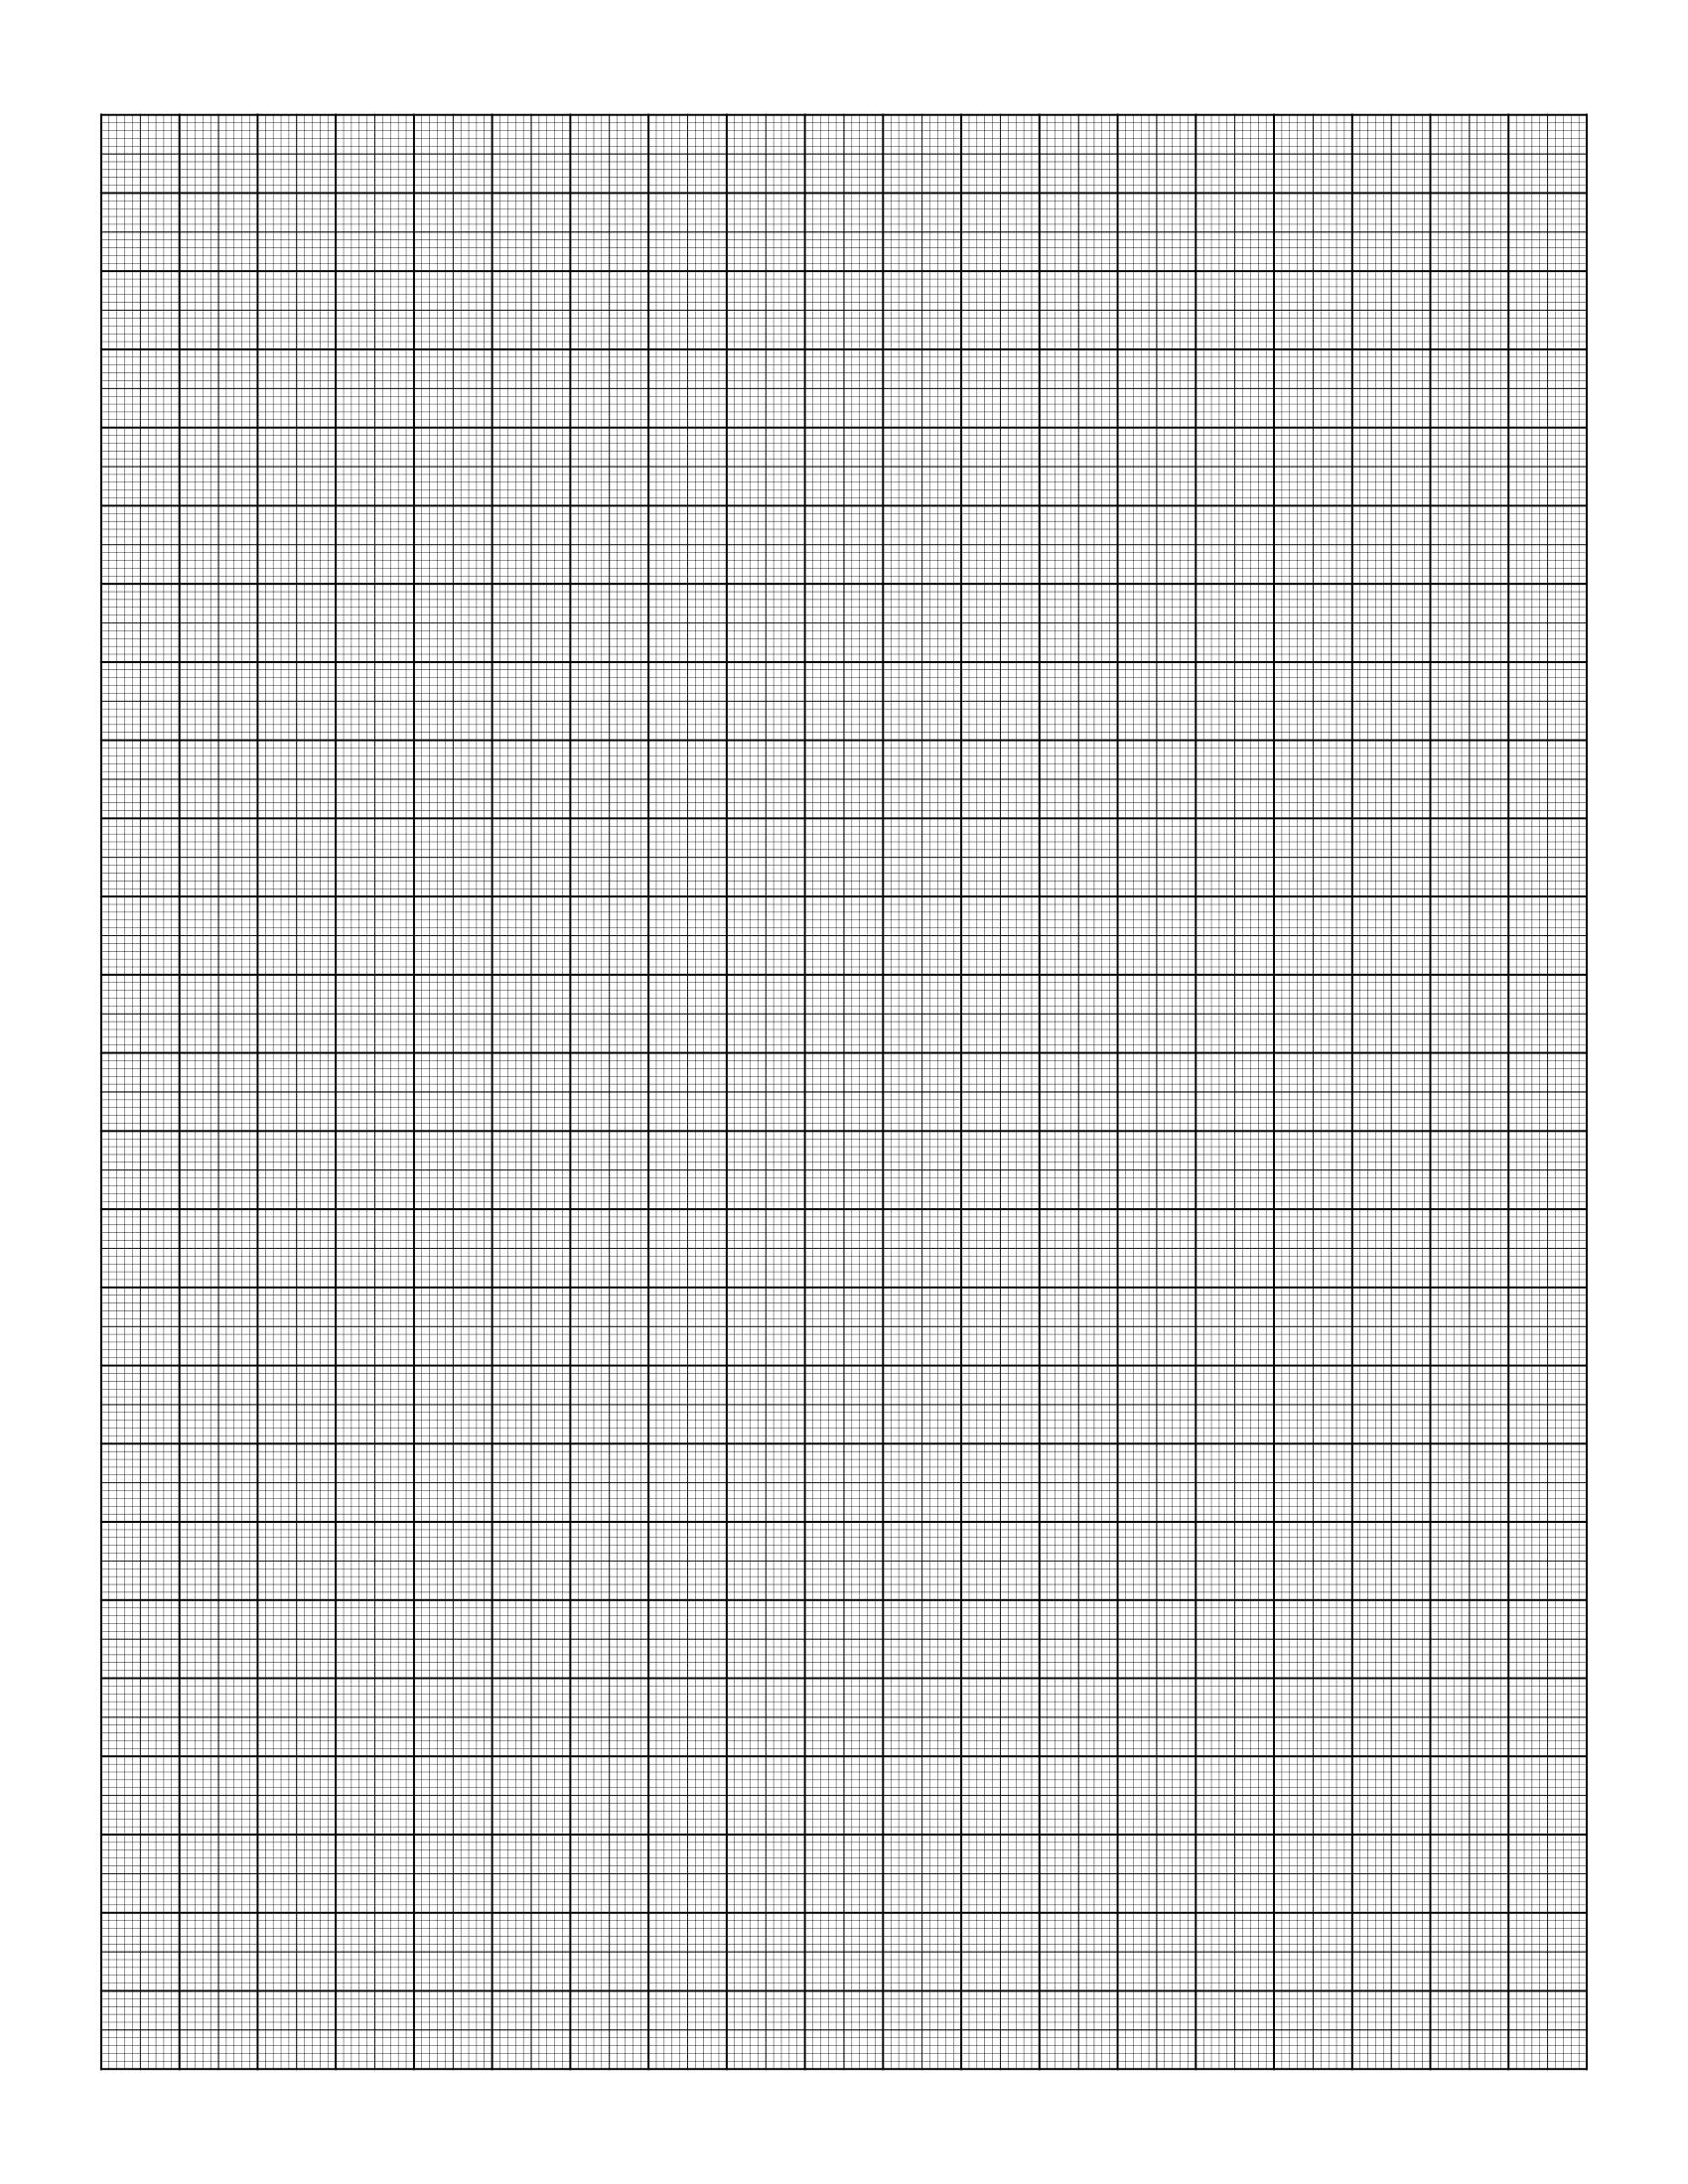 Free Online Graph Paper / Multi-Width - Half Inch Grid Paper Free Printable